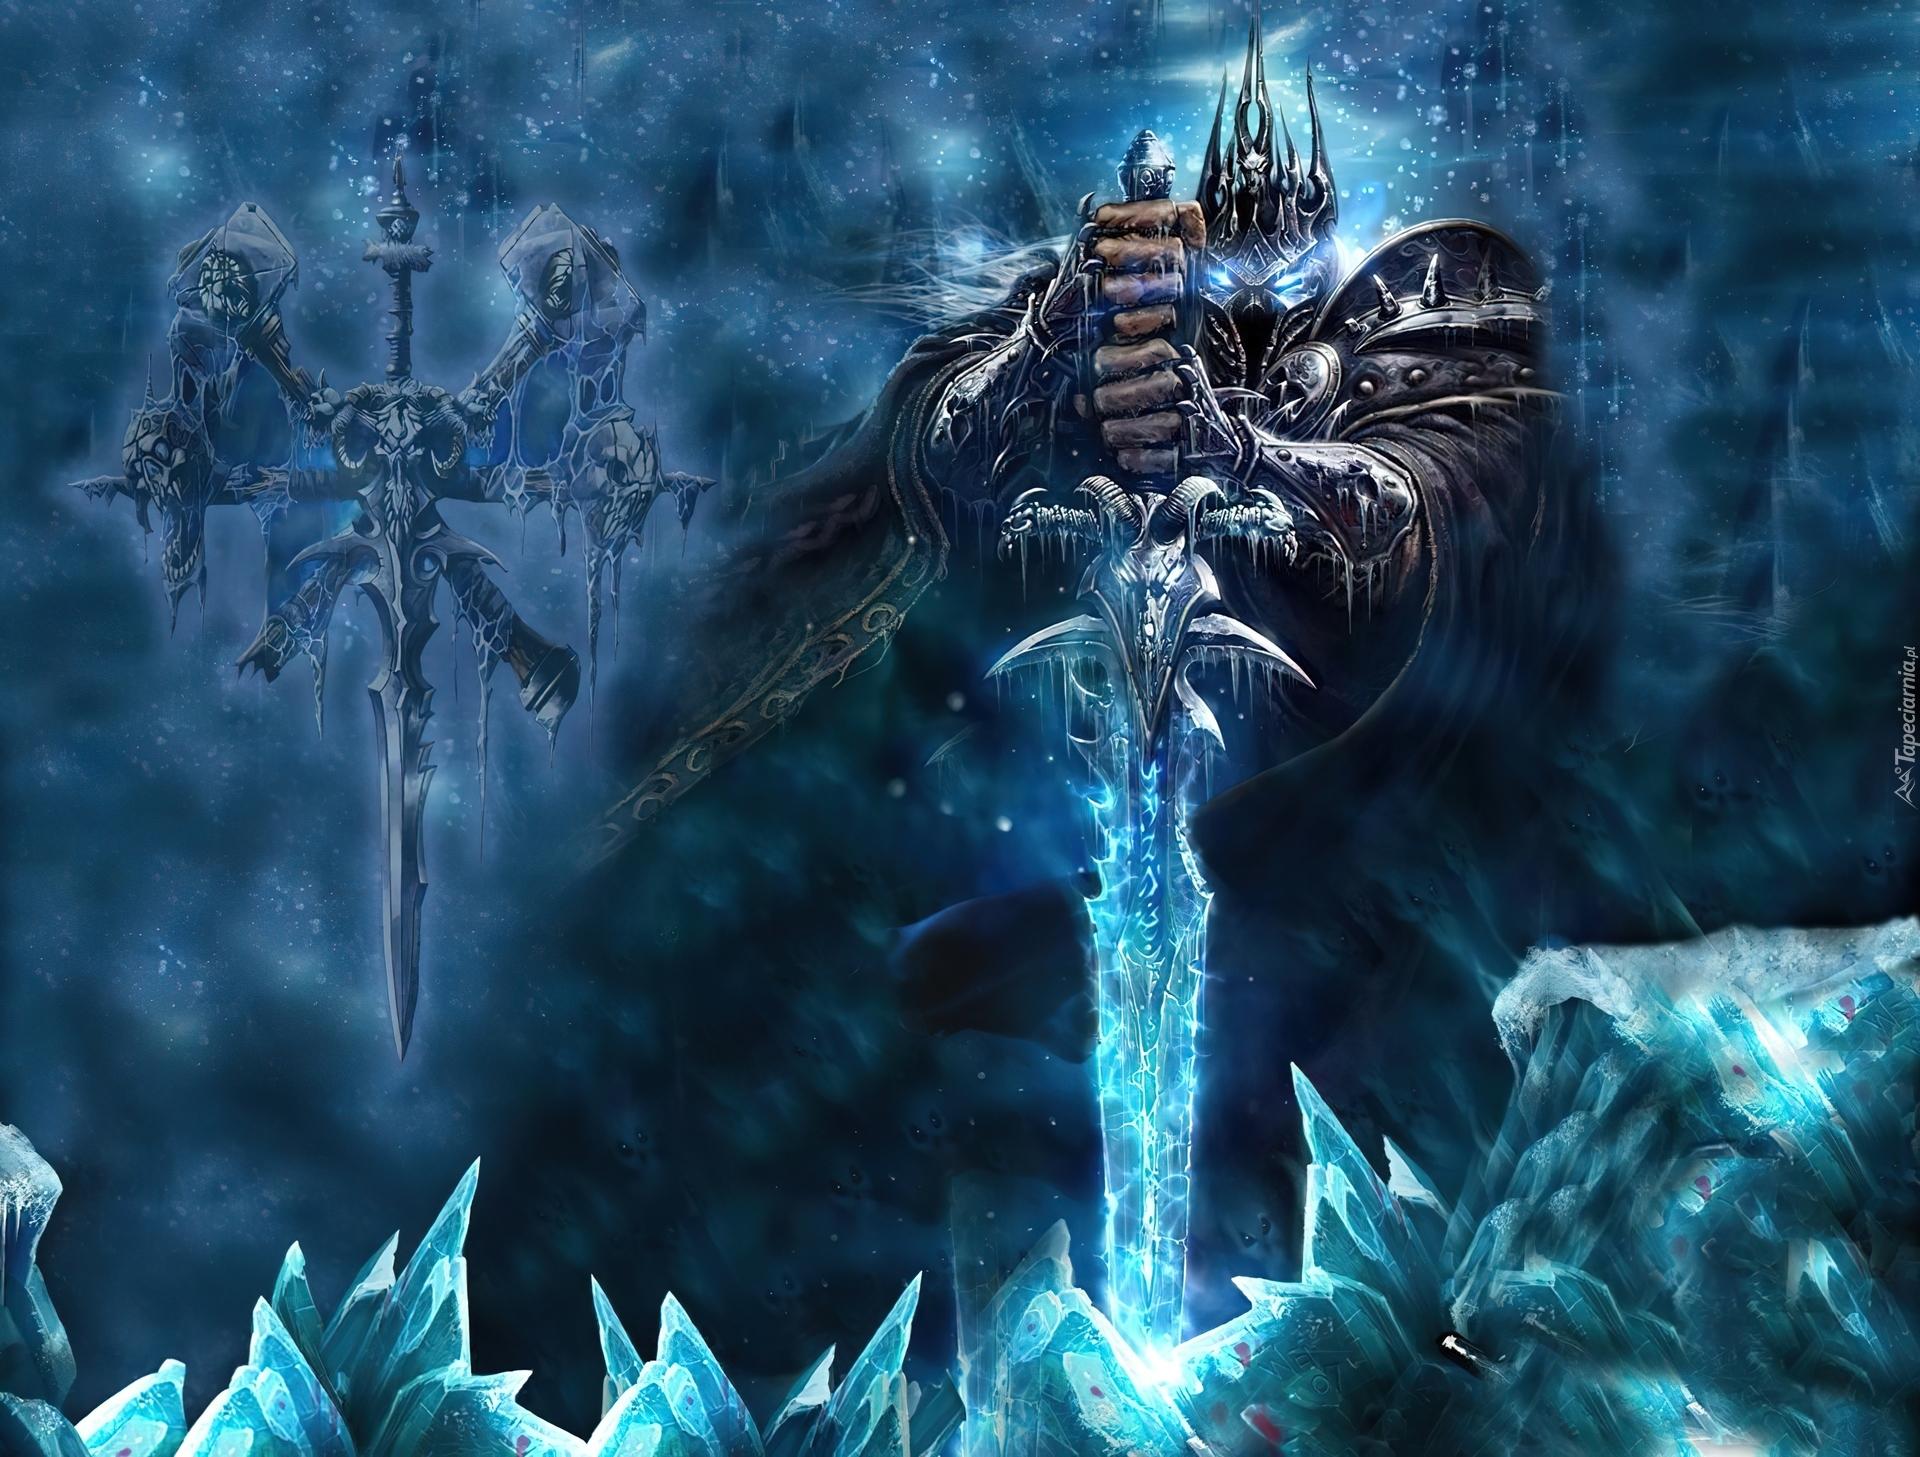 Fierce Games Hd Wallpaper: Rycerz, Zbroja, Miecz